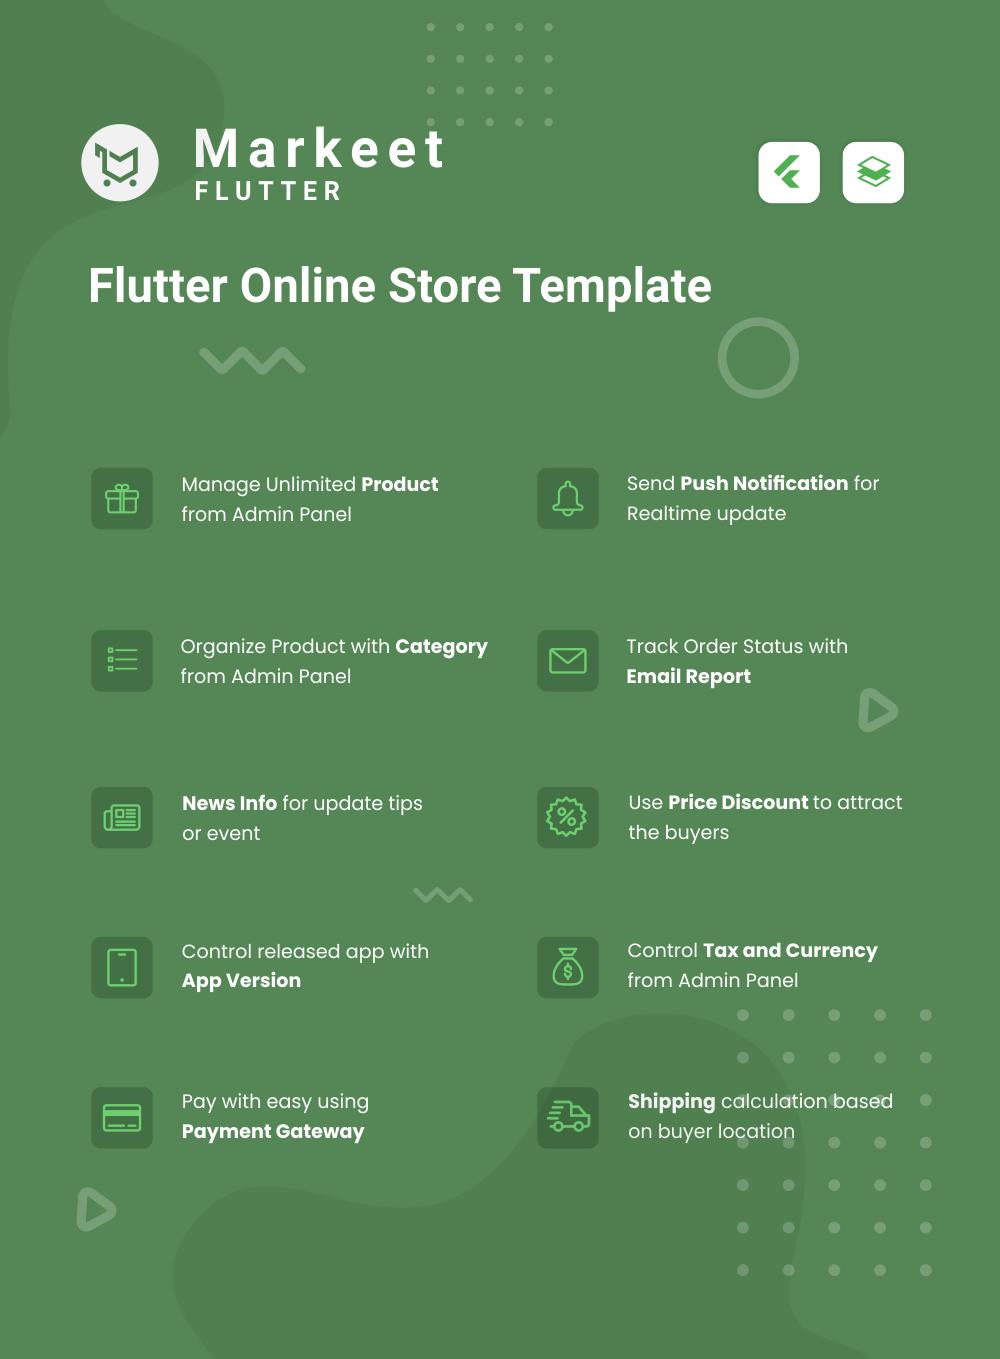 Markeet Flutter - Ecommerce Flutter App 2.0 - 4